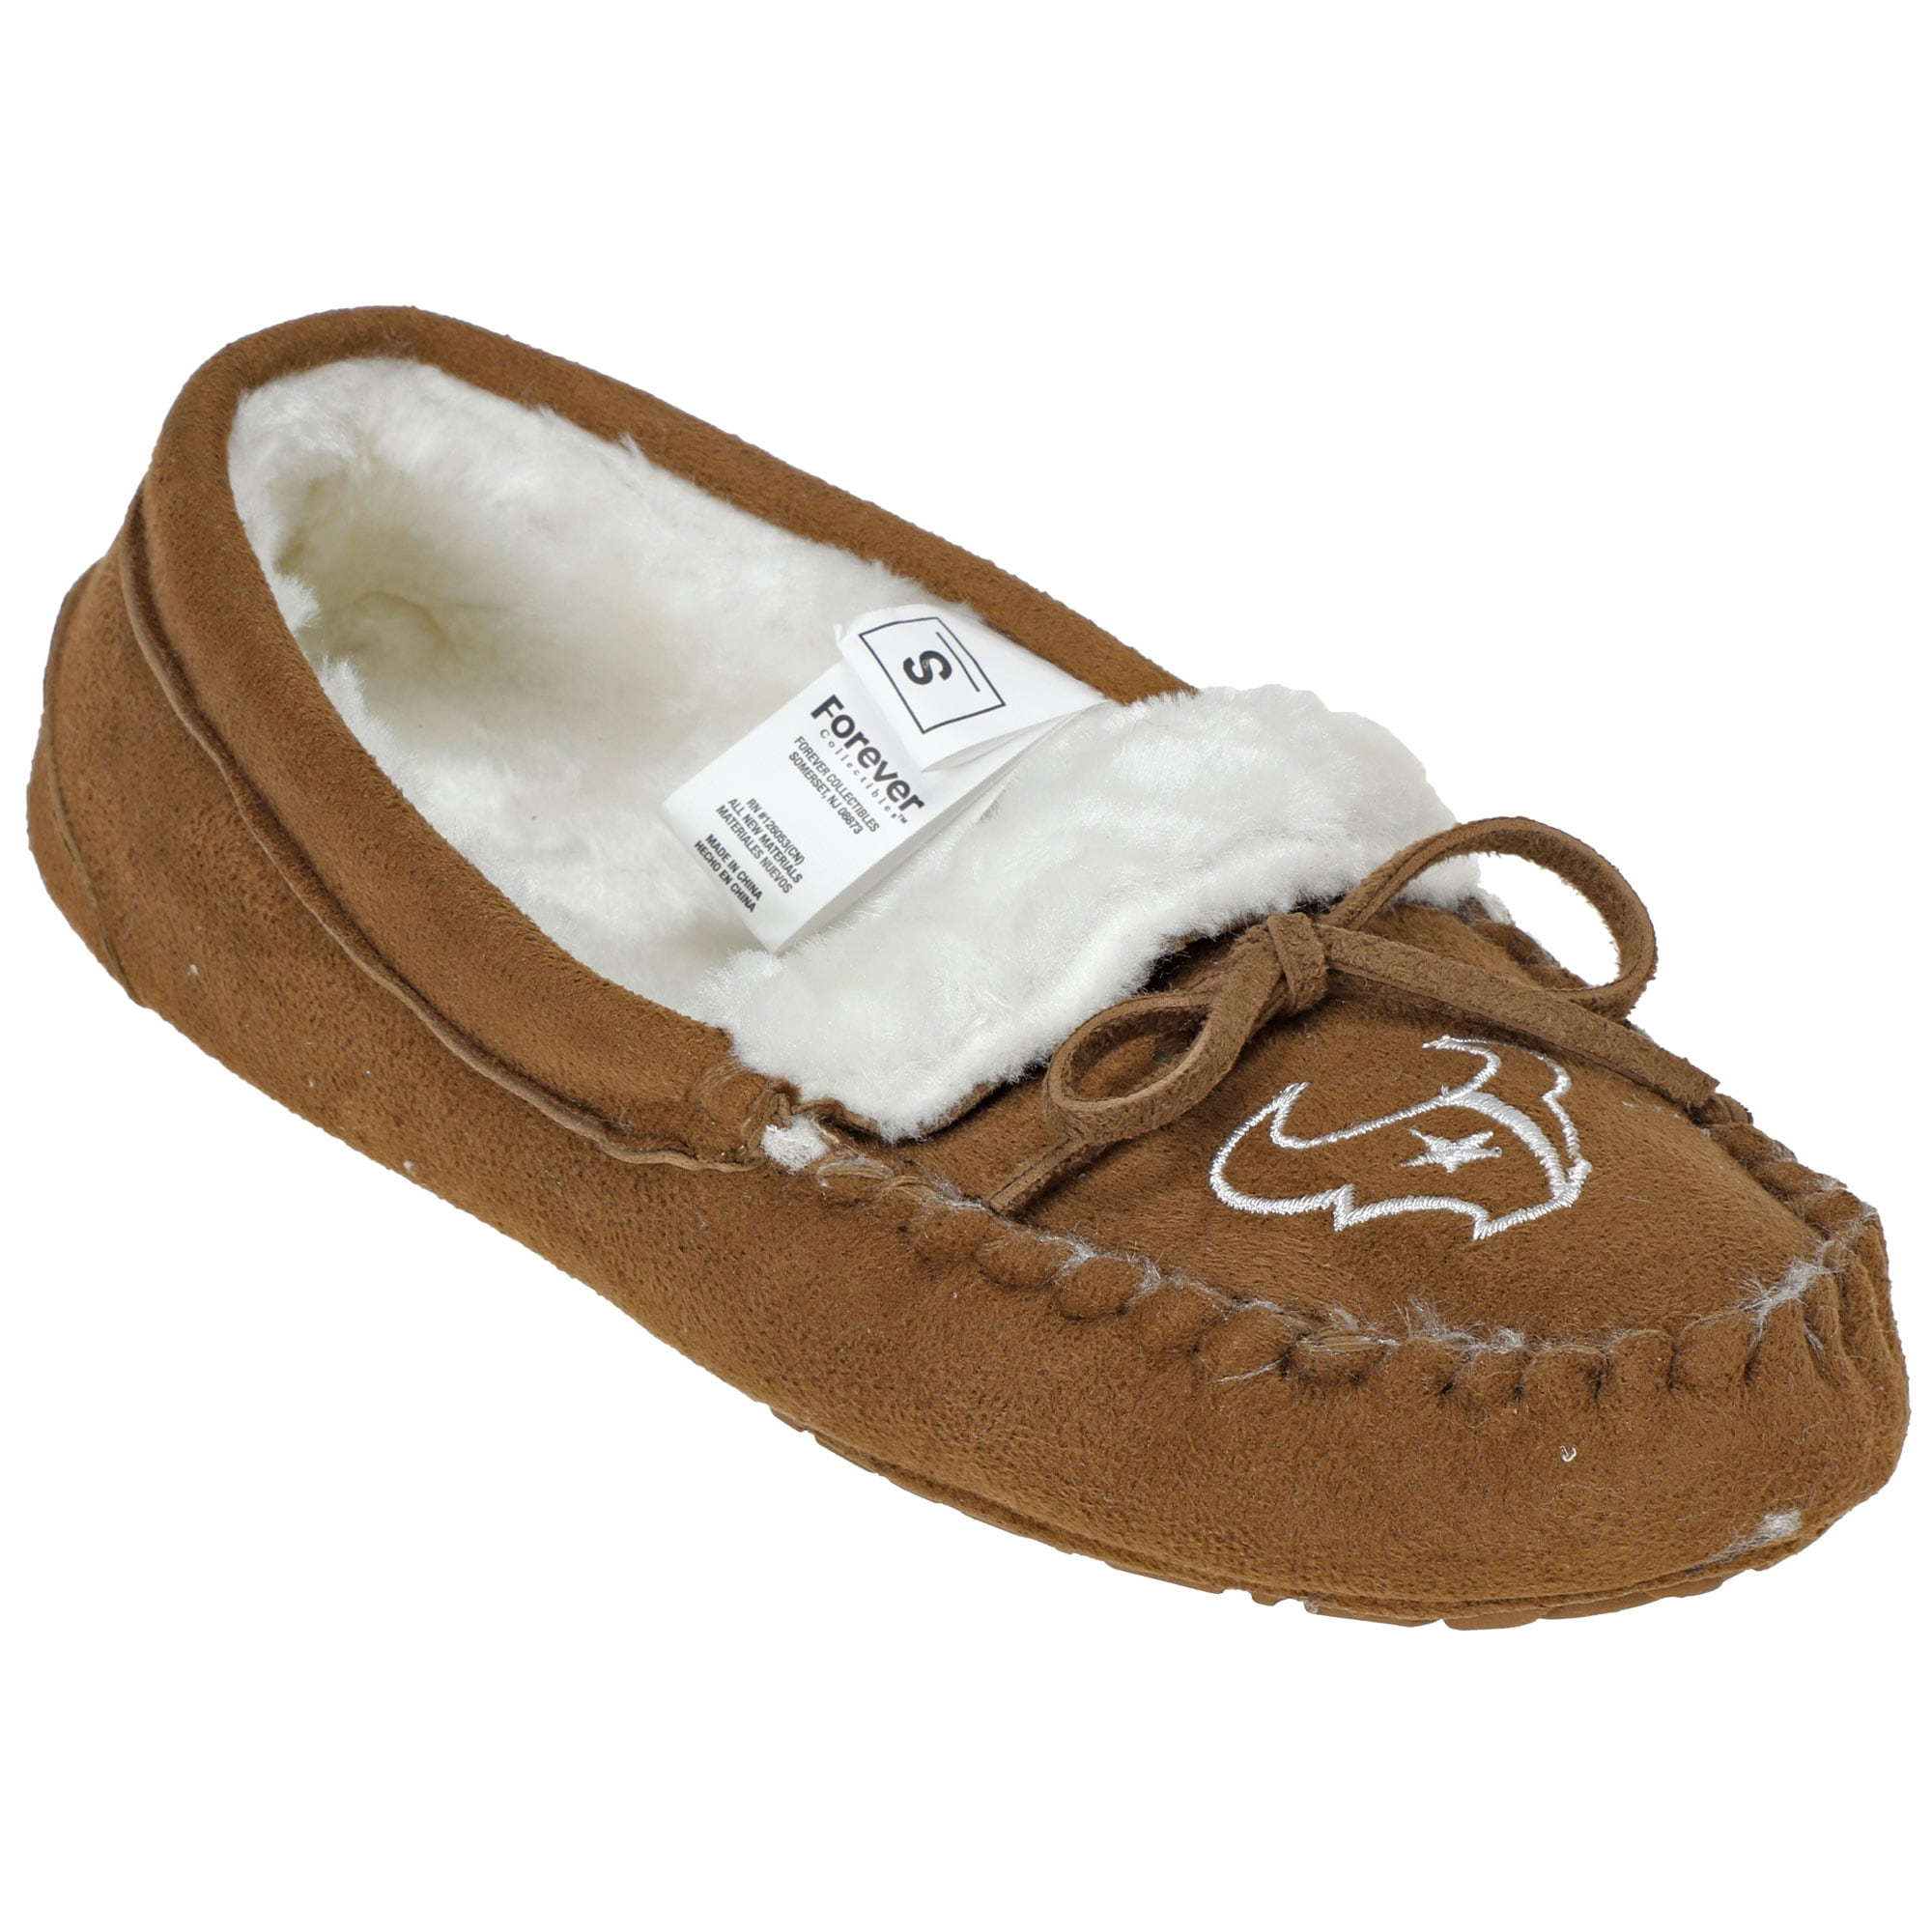 Houston Texans Women's Moccasin Slippers